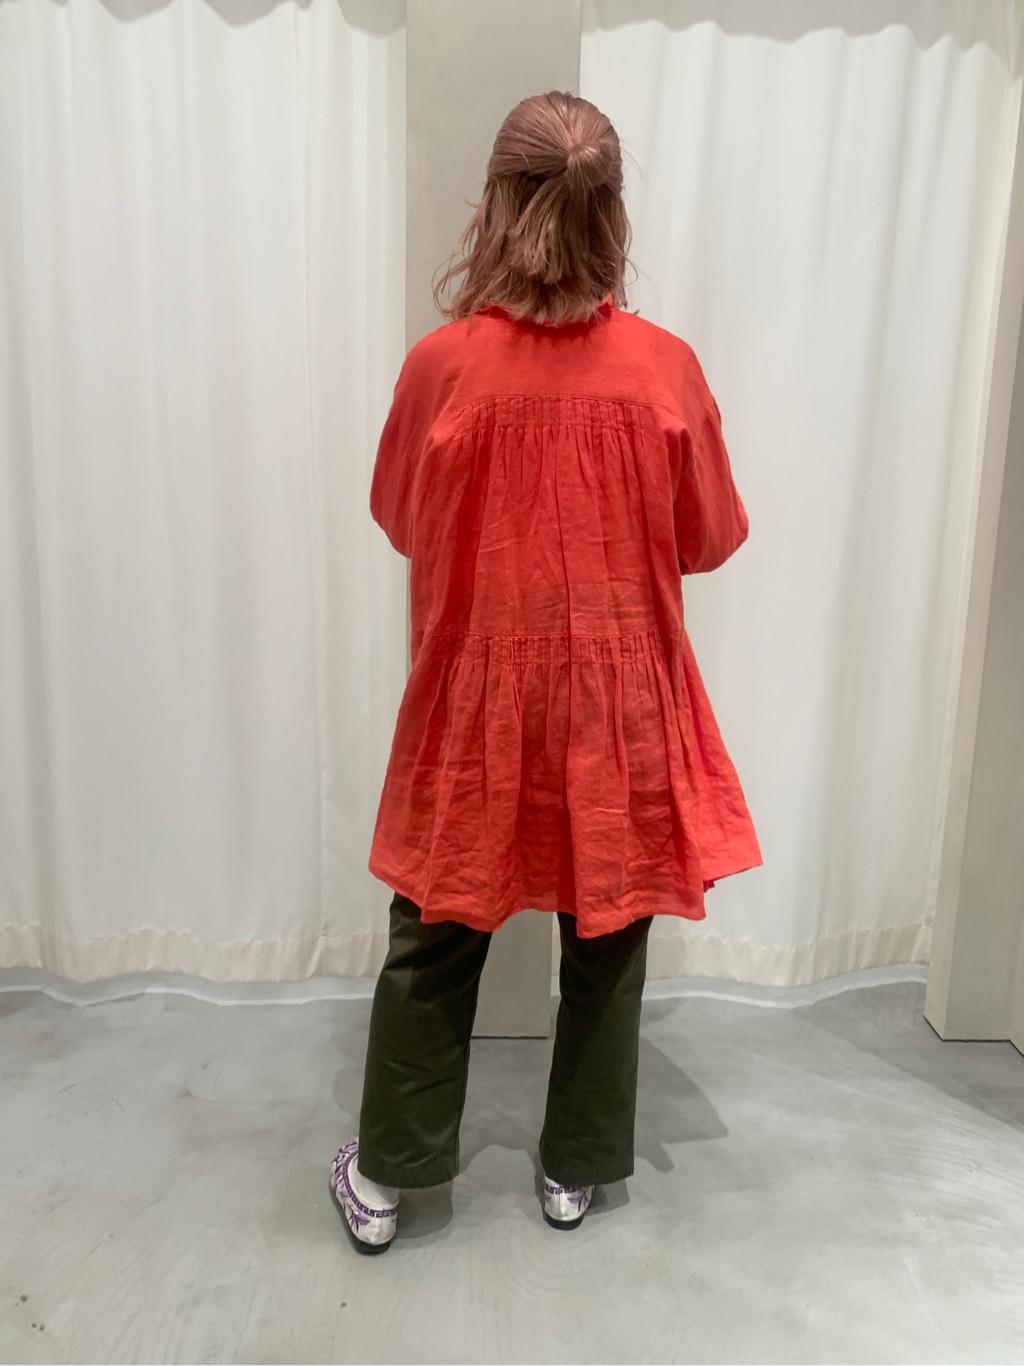 - CHILD WOMAN CHILD WOMAN , PAR ICI 東京スカイツリータウン・ソラマチ 身長:160cm 2021.04.27